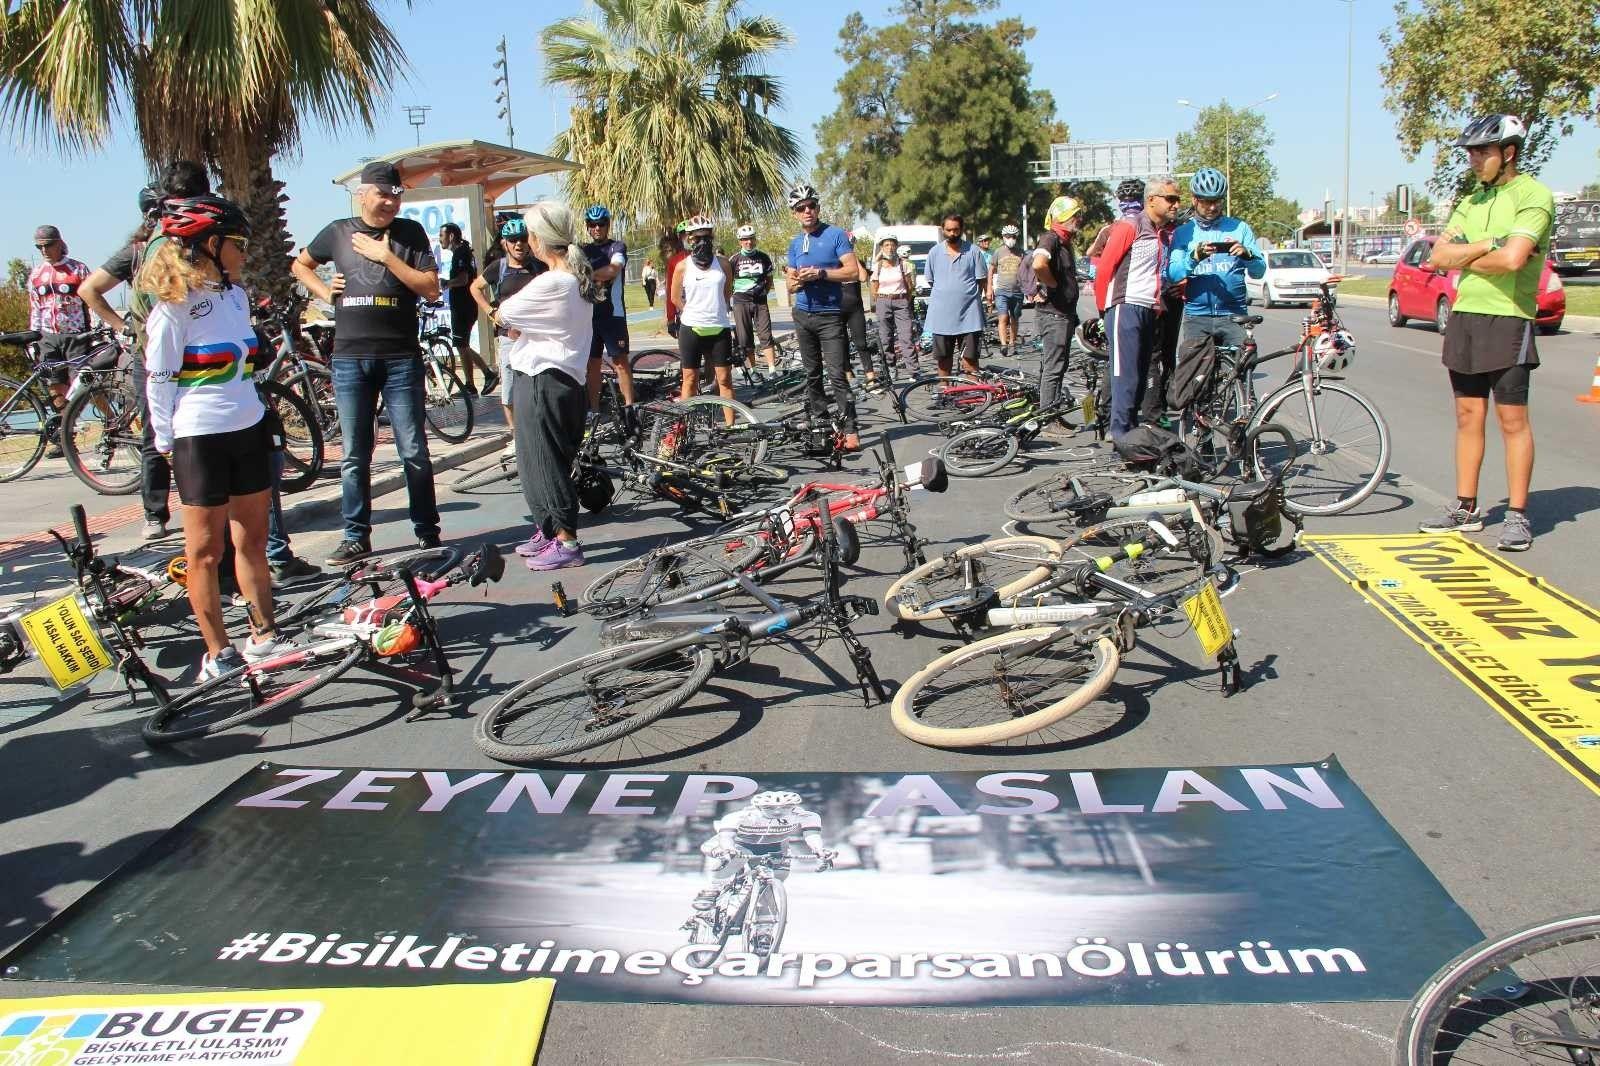 2021/09/izmirli-bisikletciler-kefenli-eylem-yapti-20210925AW42-4.jpg